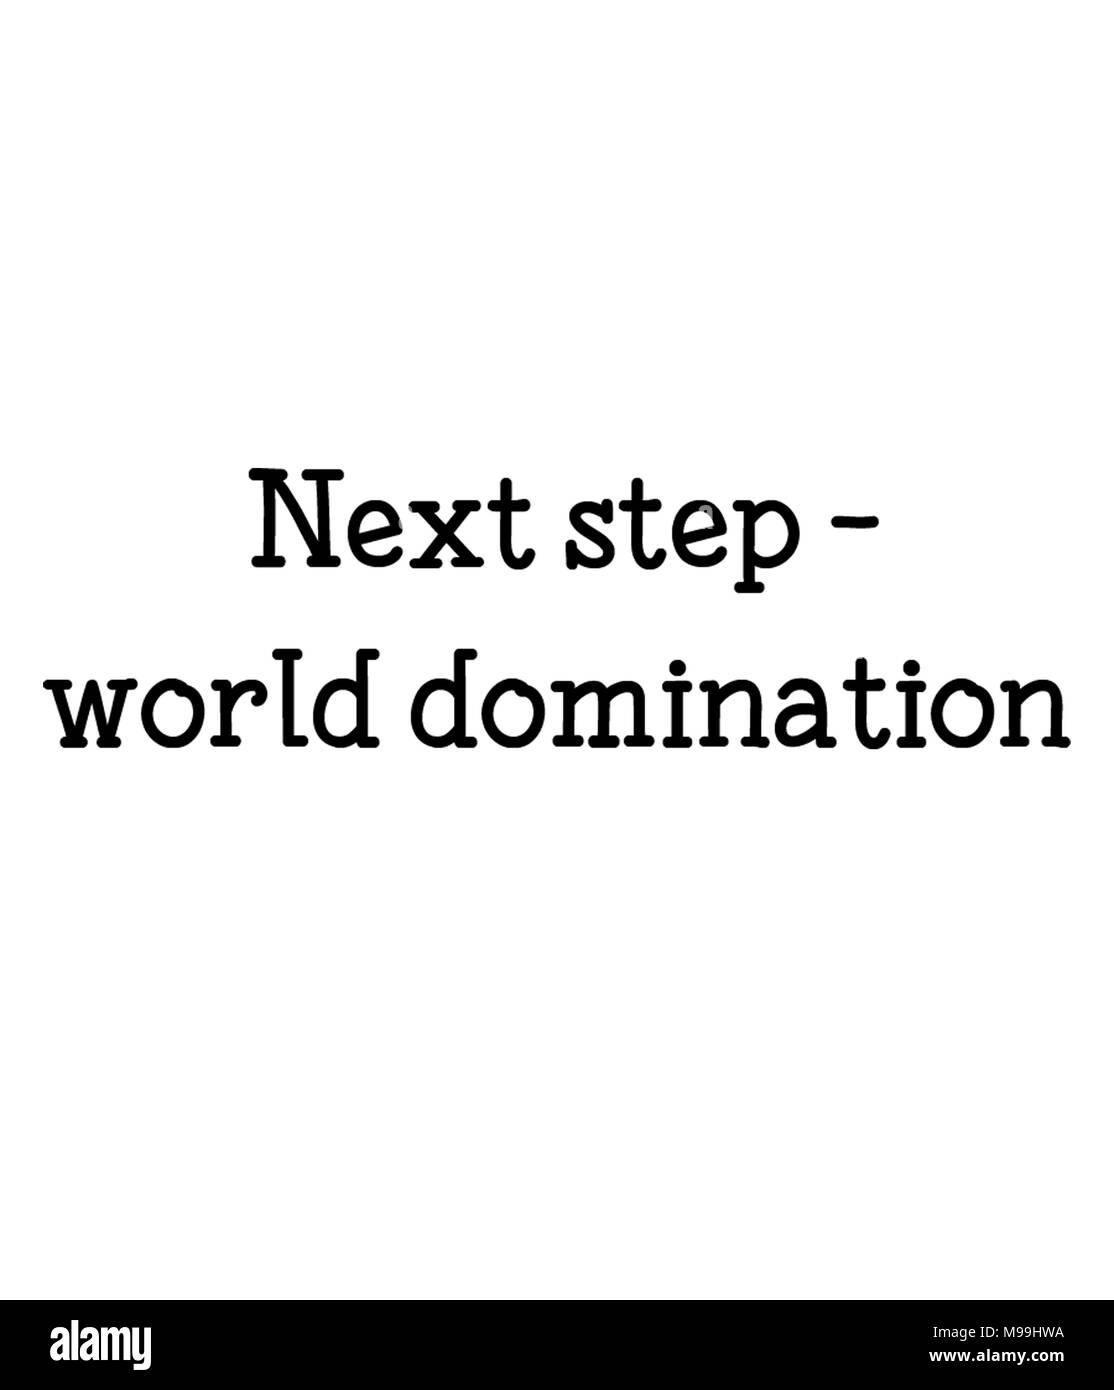 Next step - world domination - Stock Image